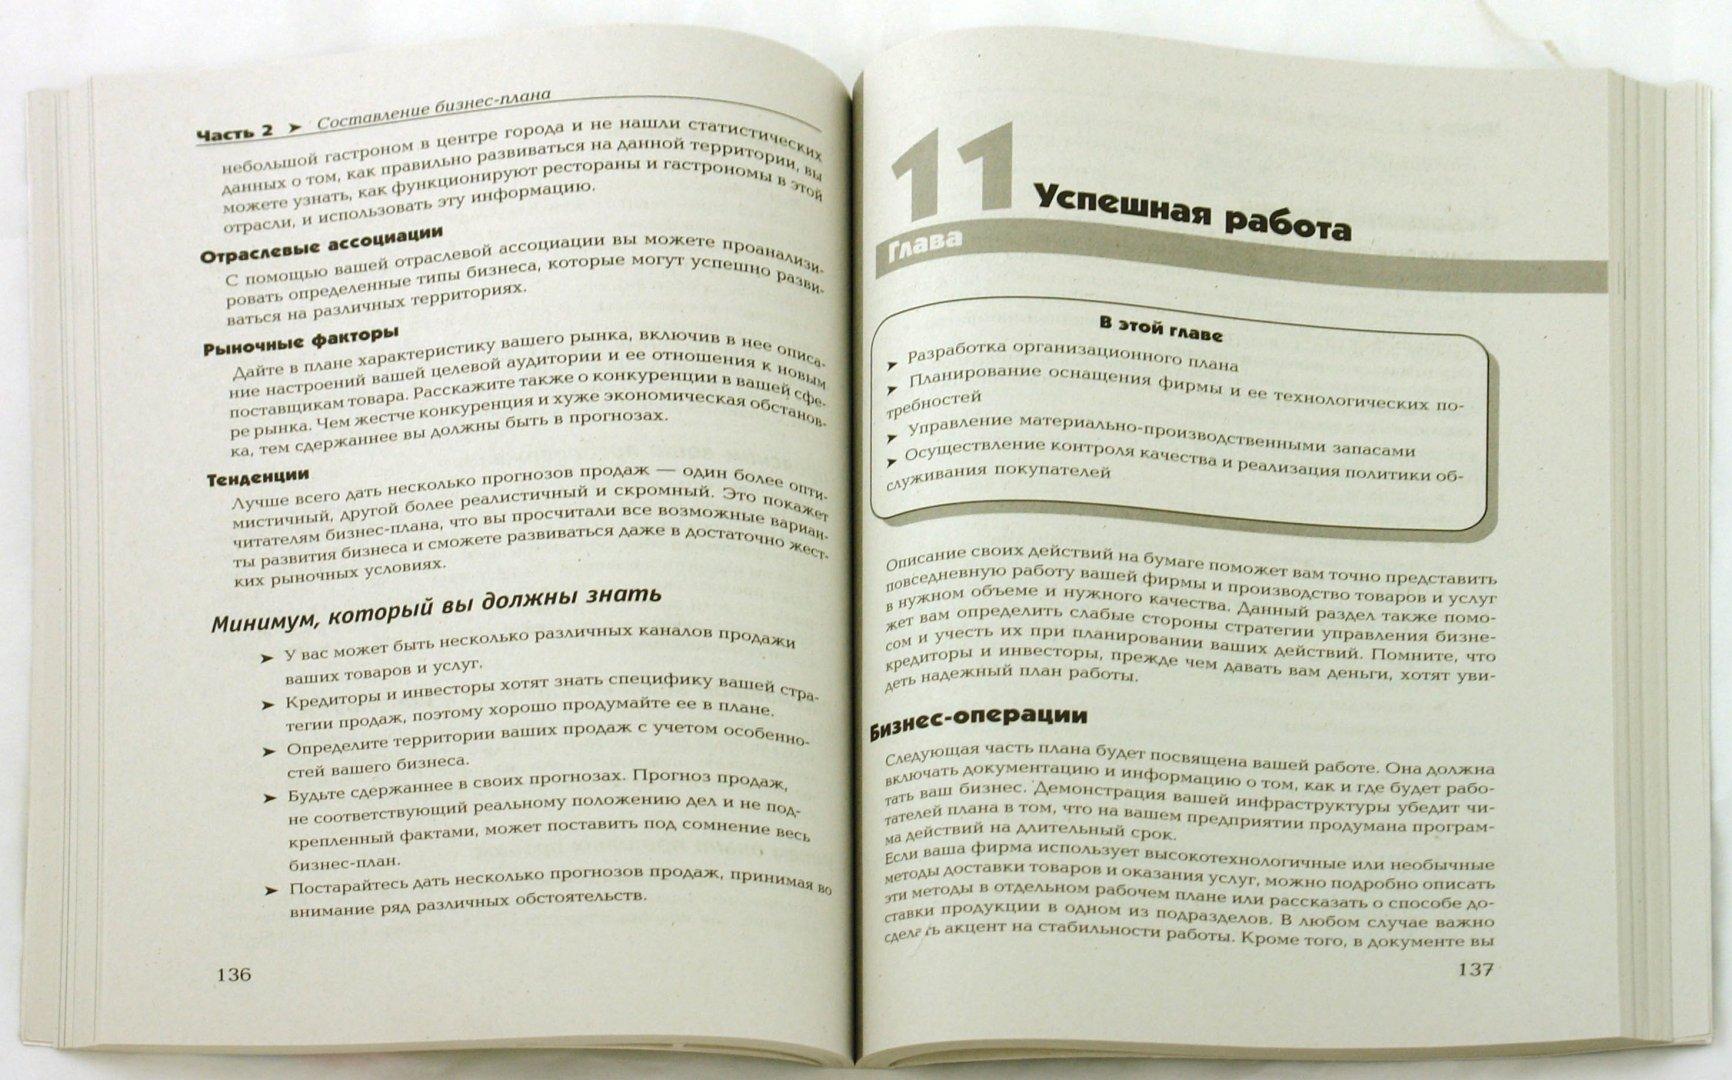 Иллюстрация 1 из 2 для Бизнес-план - Моран, Джонсон | Лабиринт - книги. Источник: Лабиринт